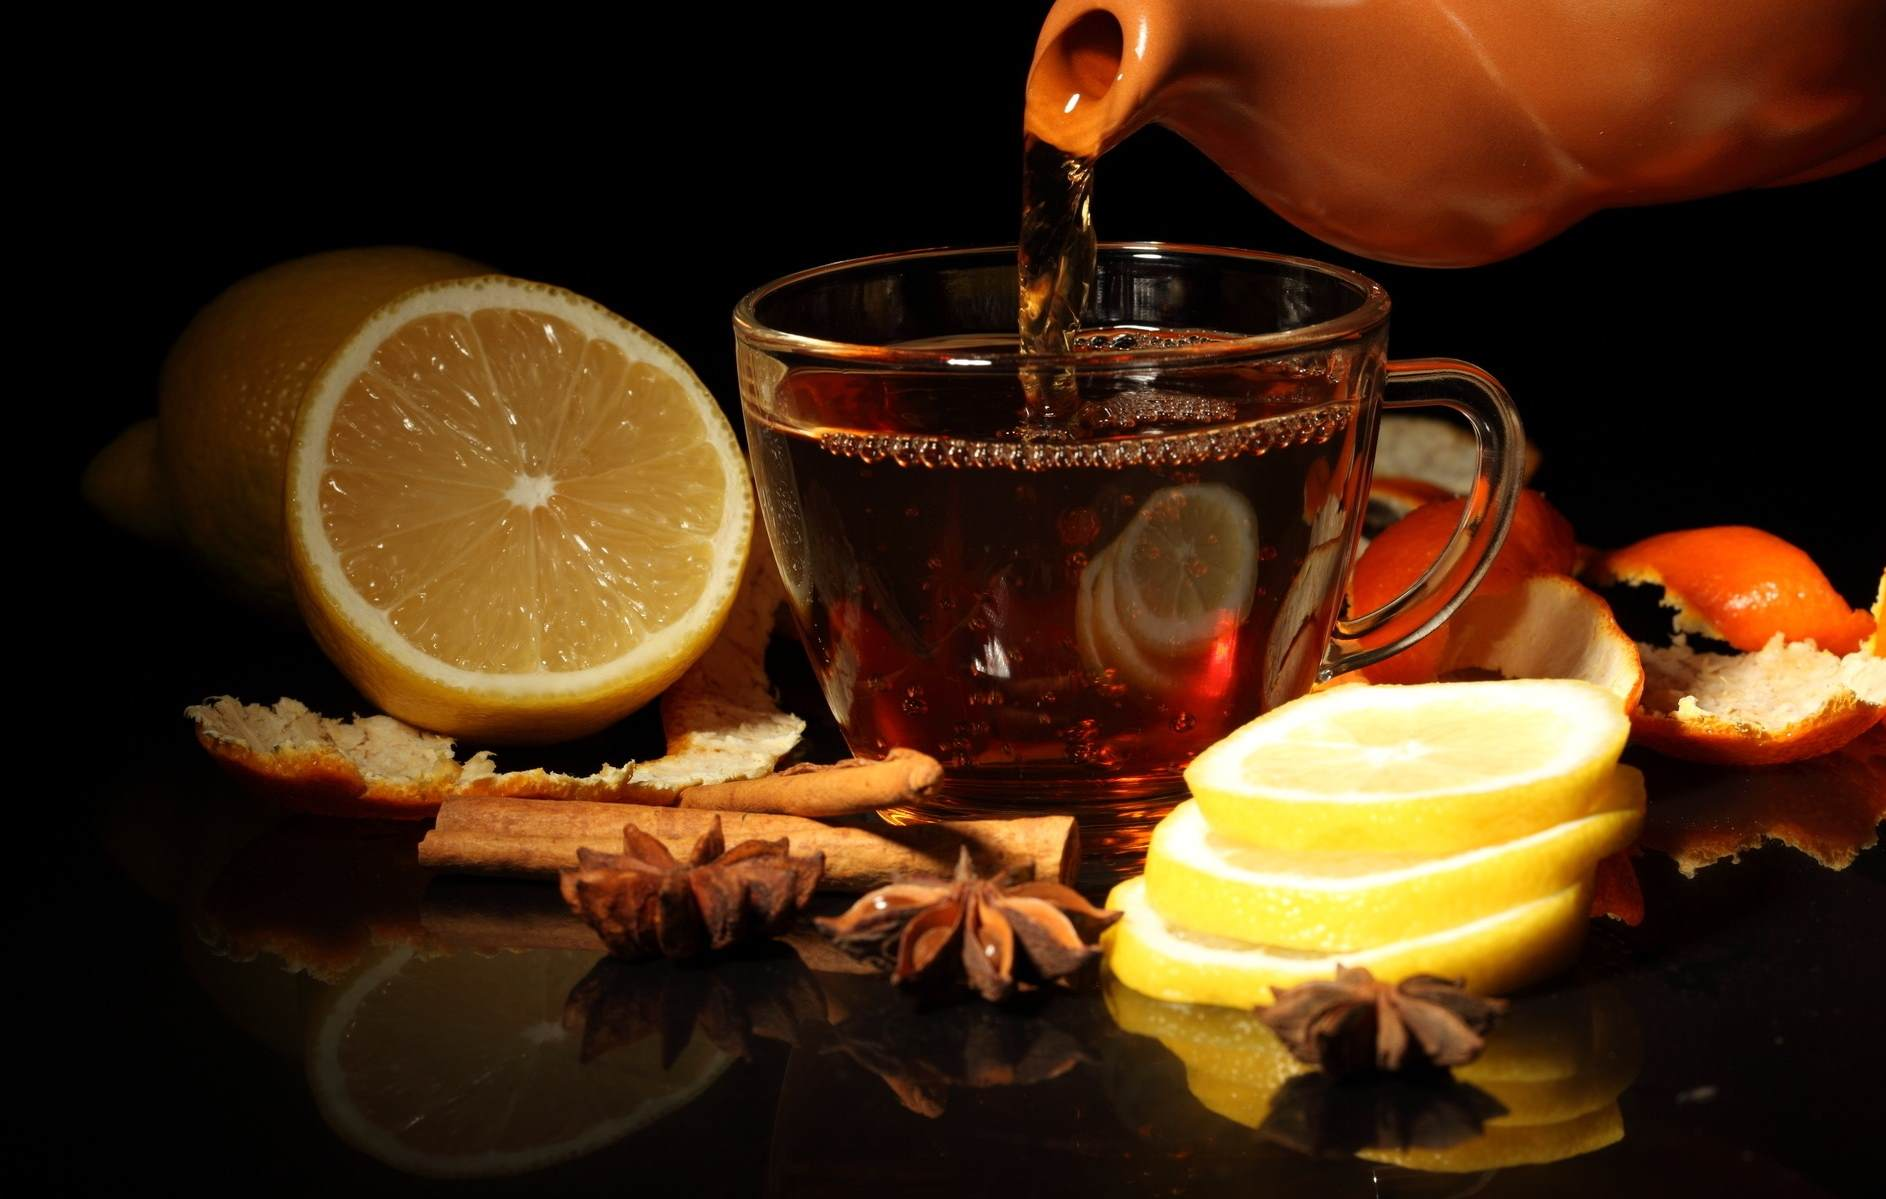 Лимонный пряный чай